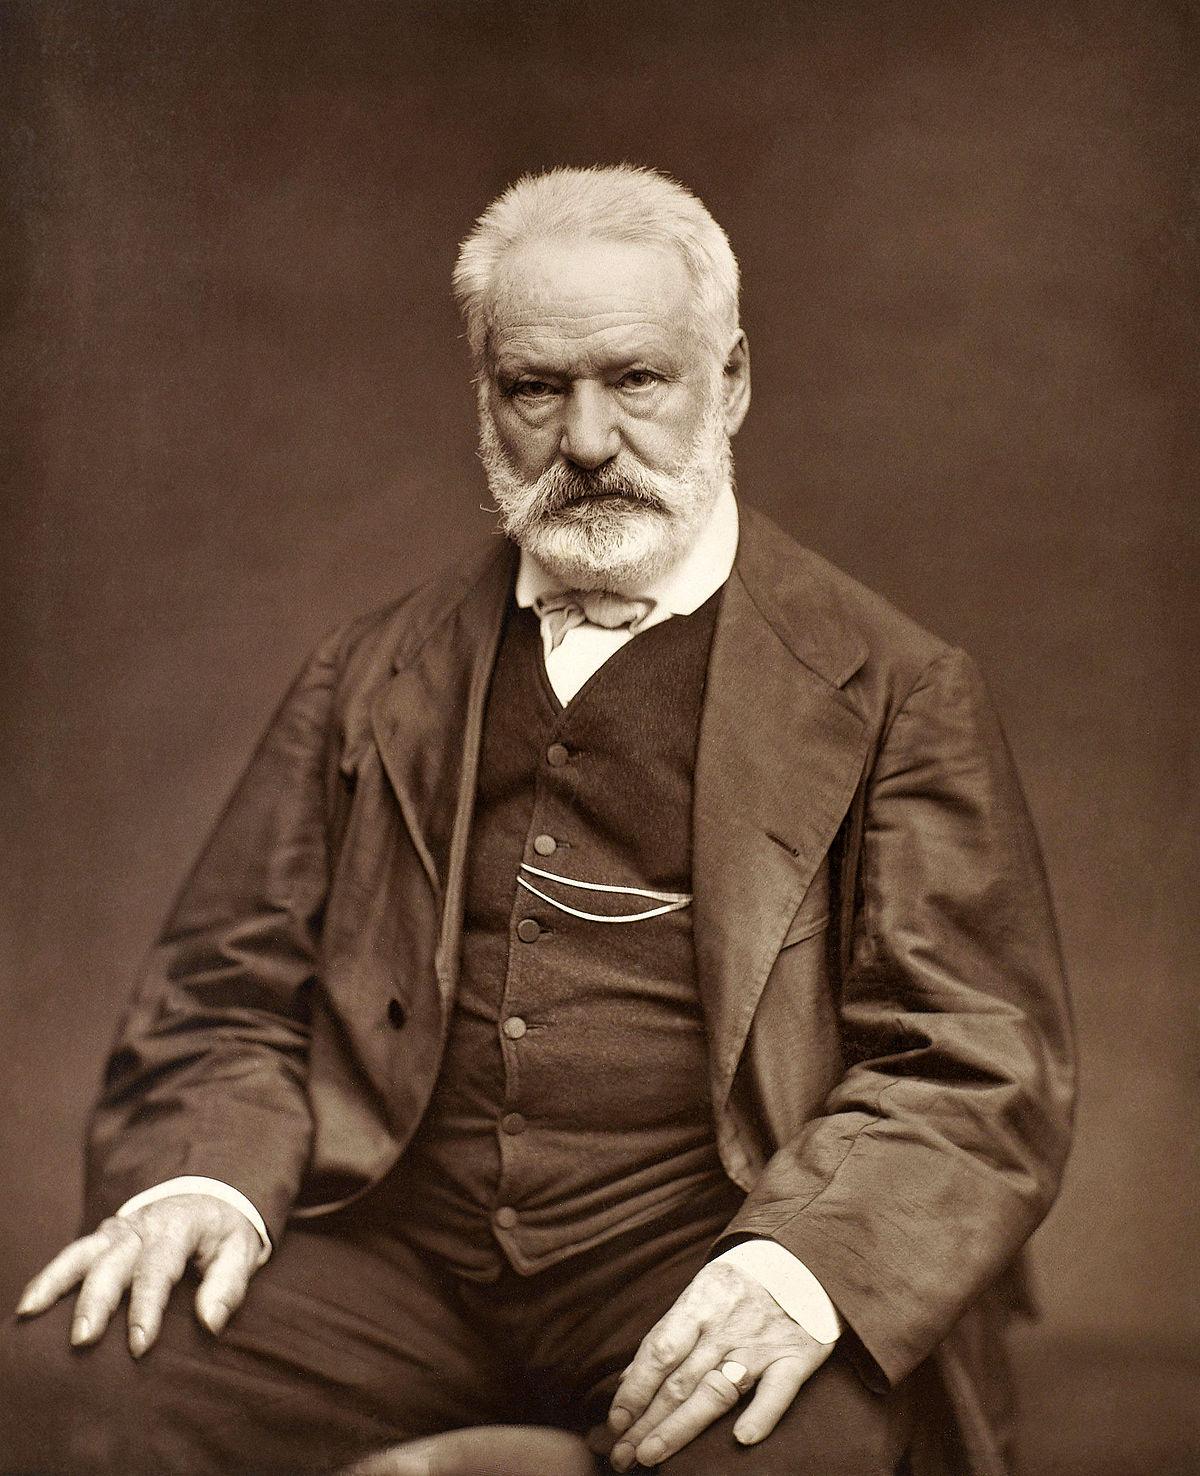 O Βίκτωρ Ουγκώ από τον Étienne Carjat, 1876 - Εθνική Βιβλιοθήκη της Γαλλίας